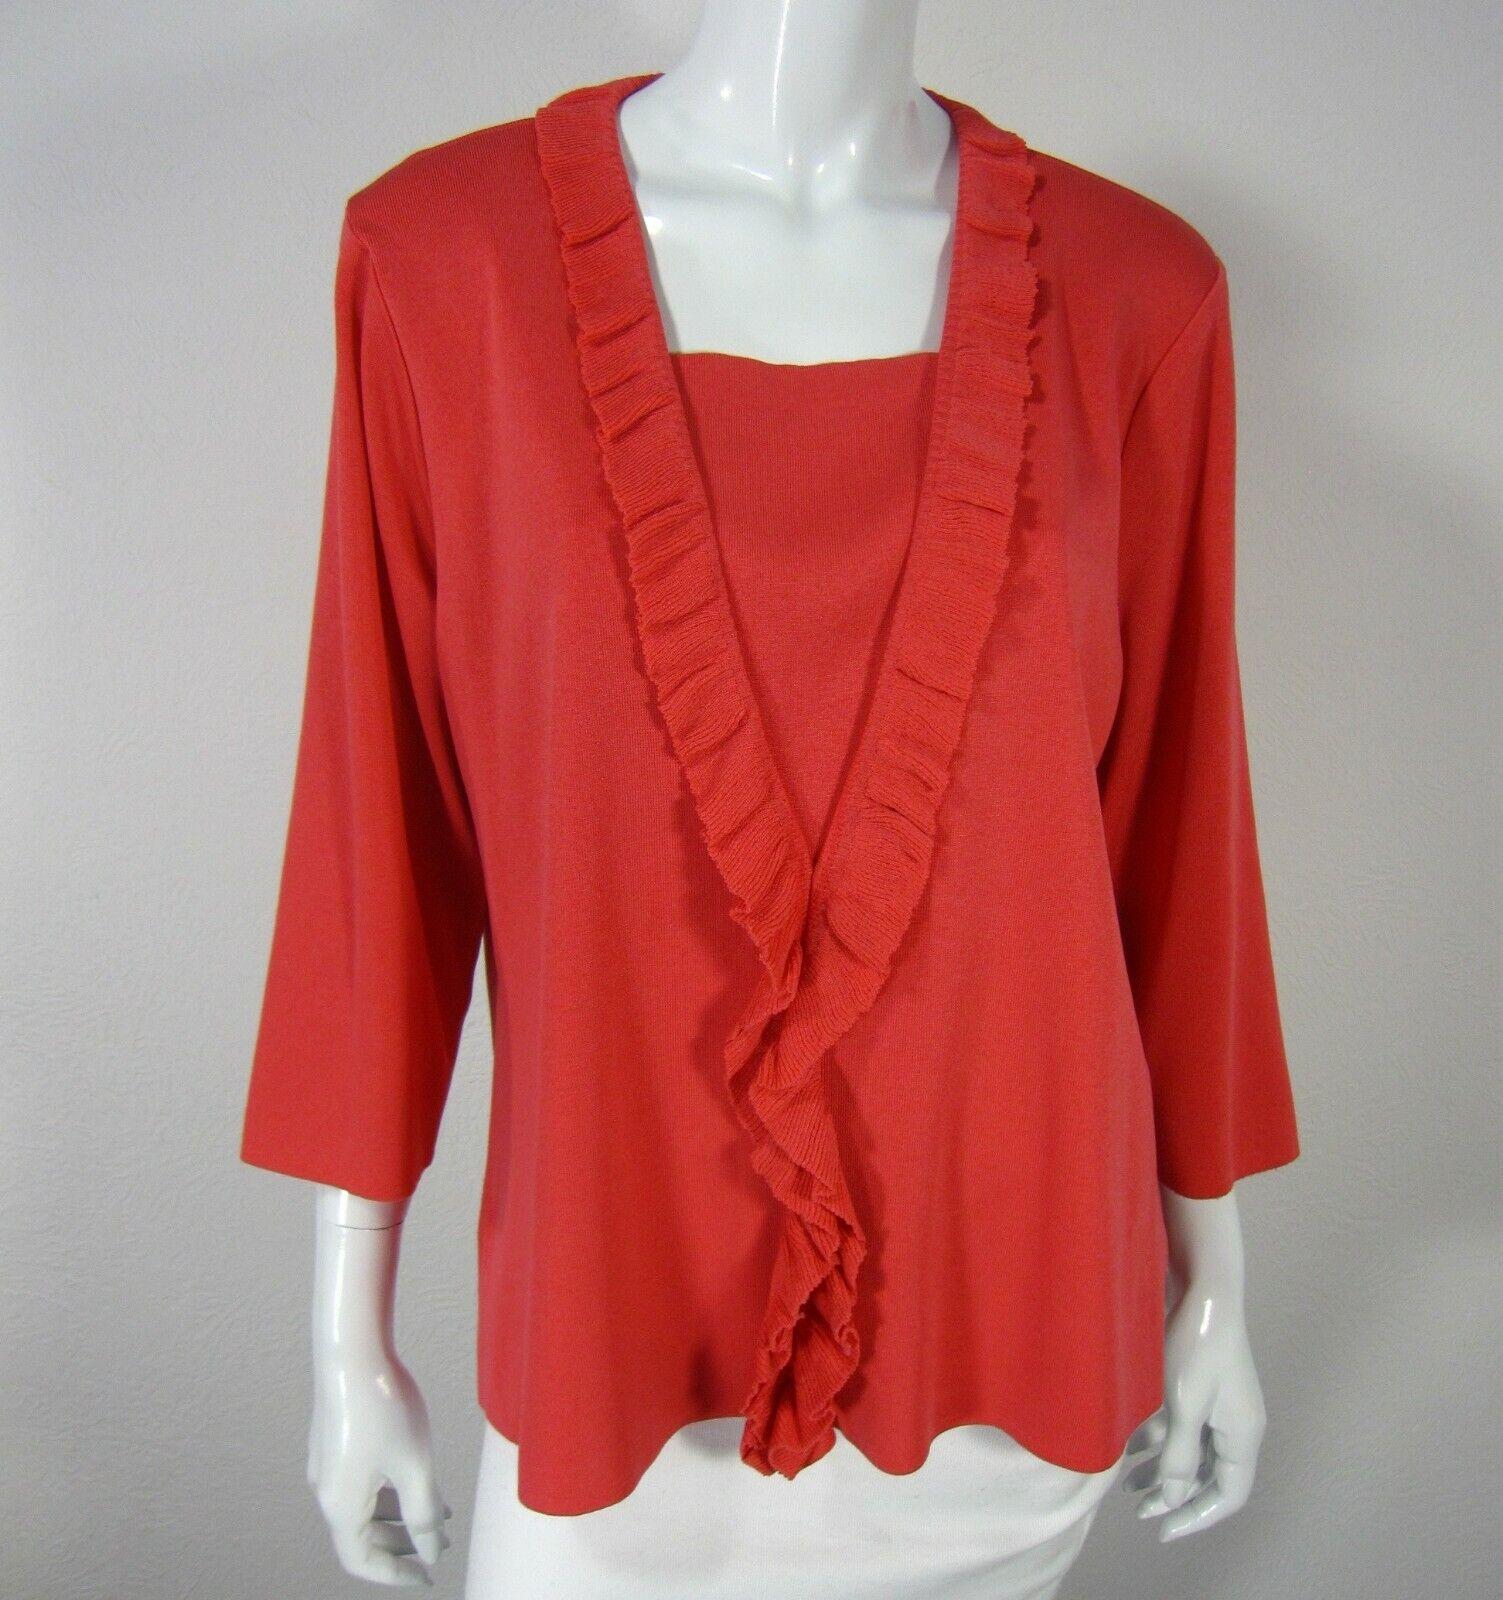 Exclusively Misook Long Sleeve Ruffled Neck Blouse Sweater  X Large XL Orange